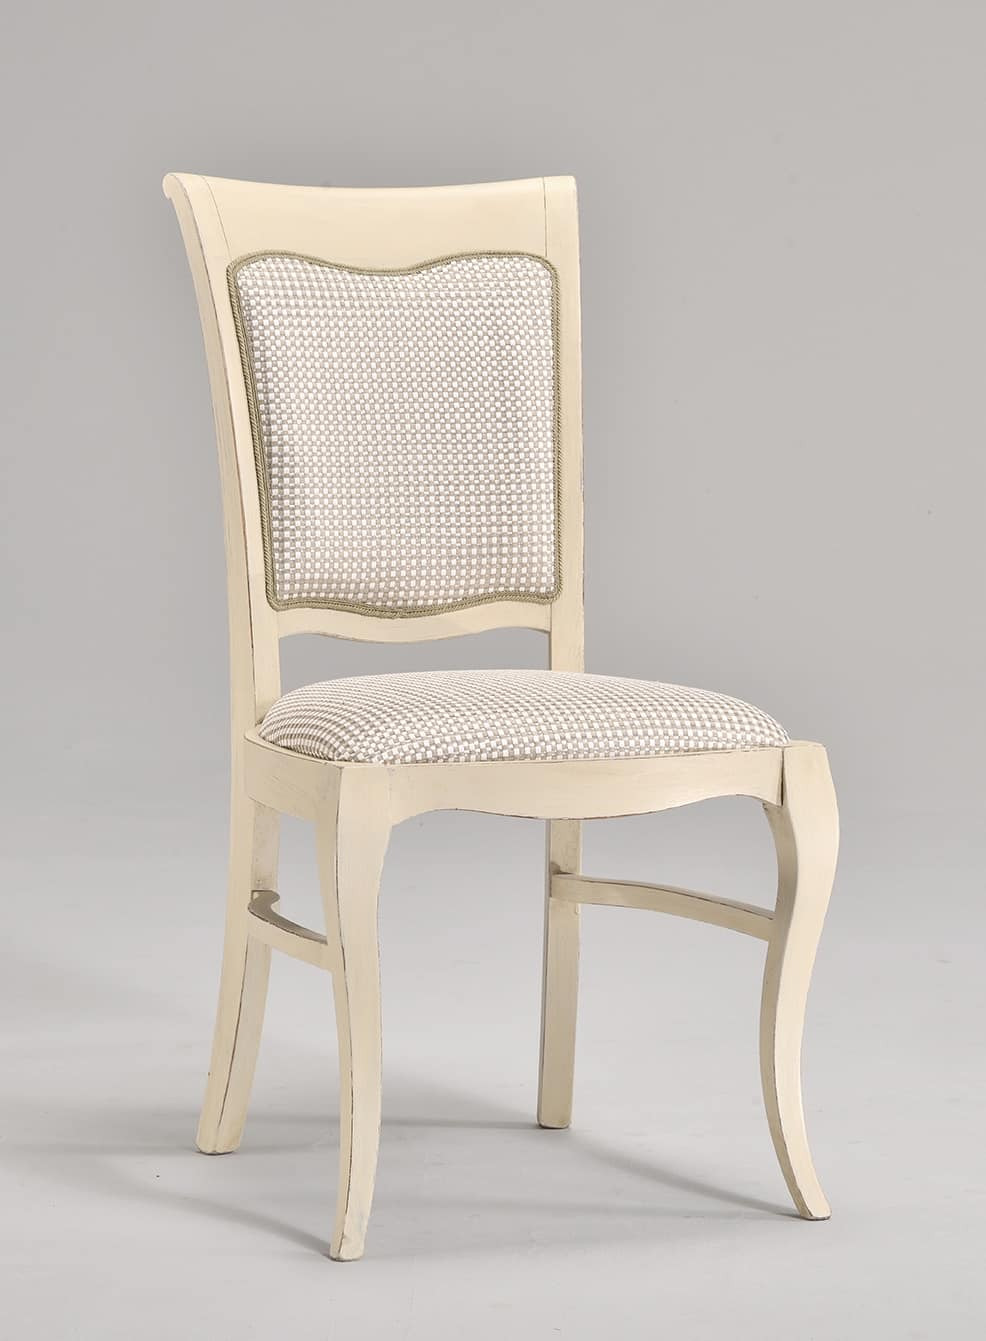 Sedia per soggiorni in stile classico, imbottita  IDFdesign